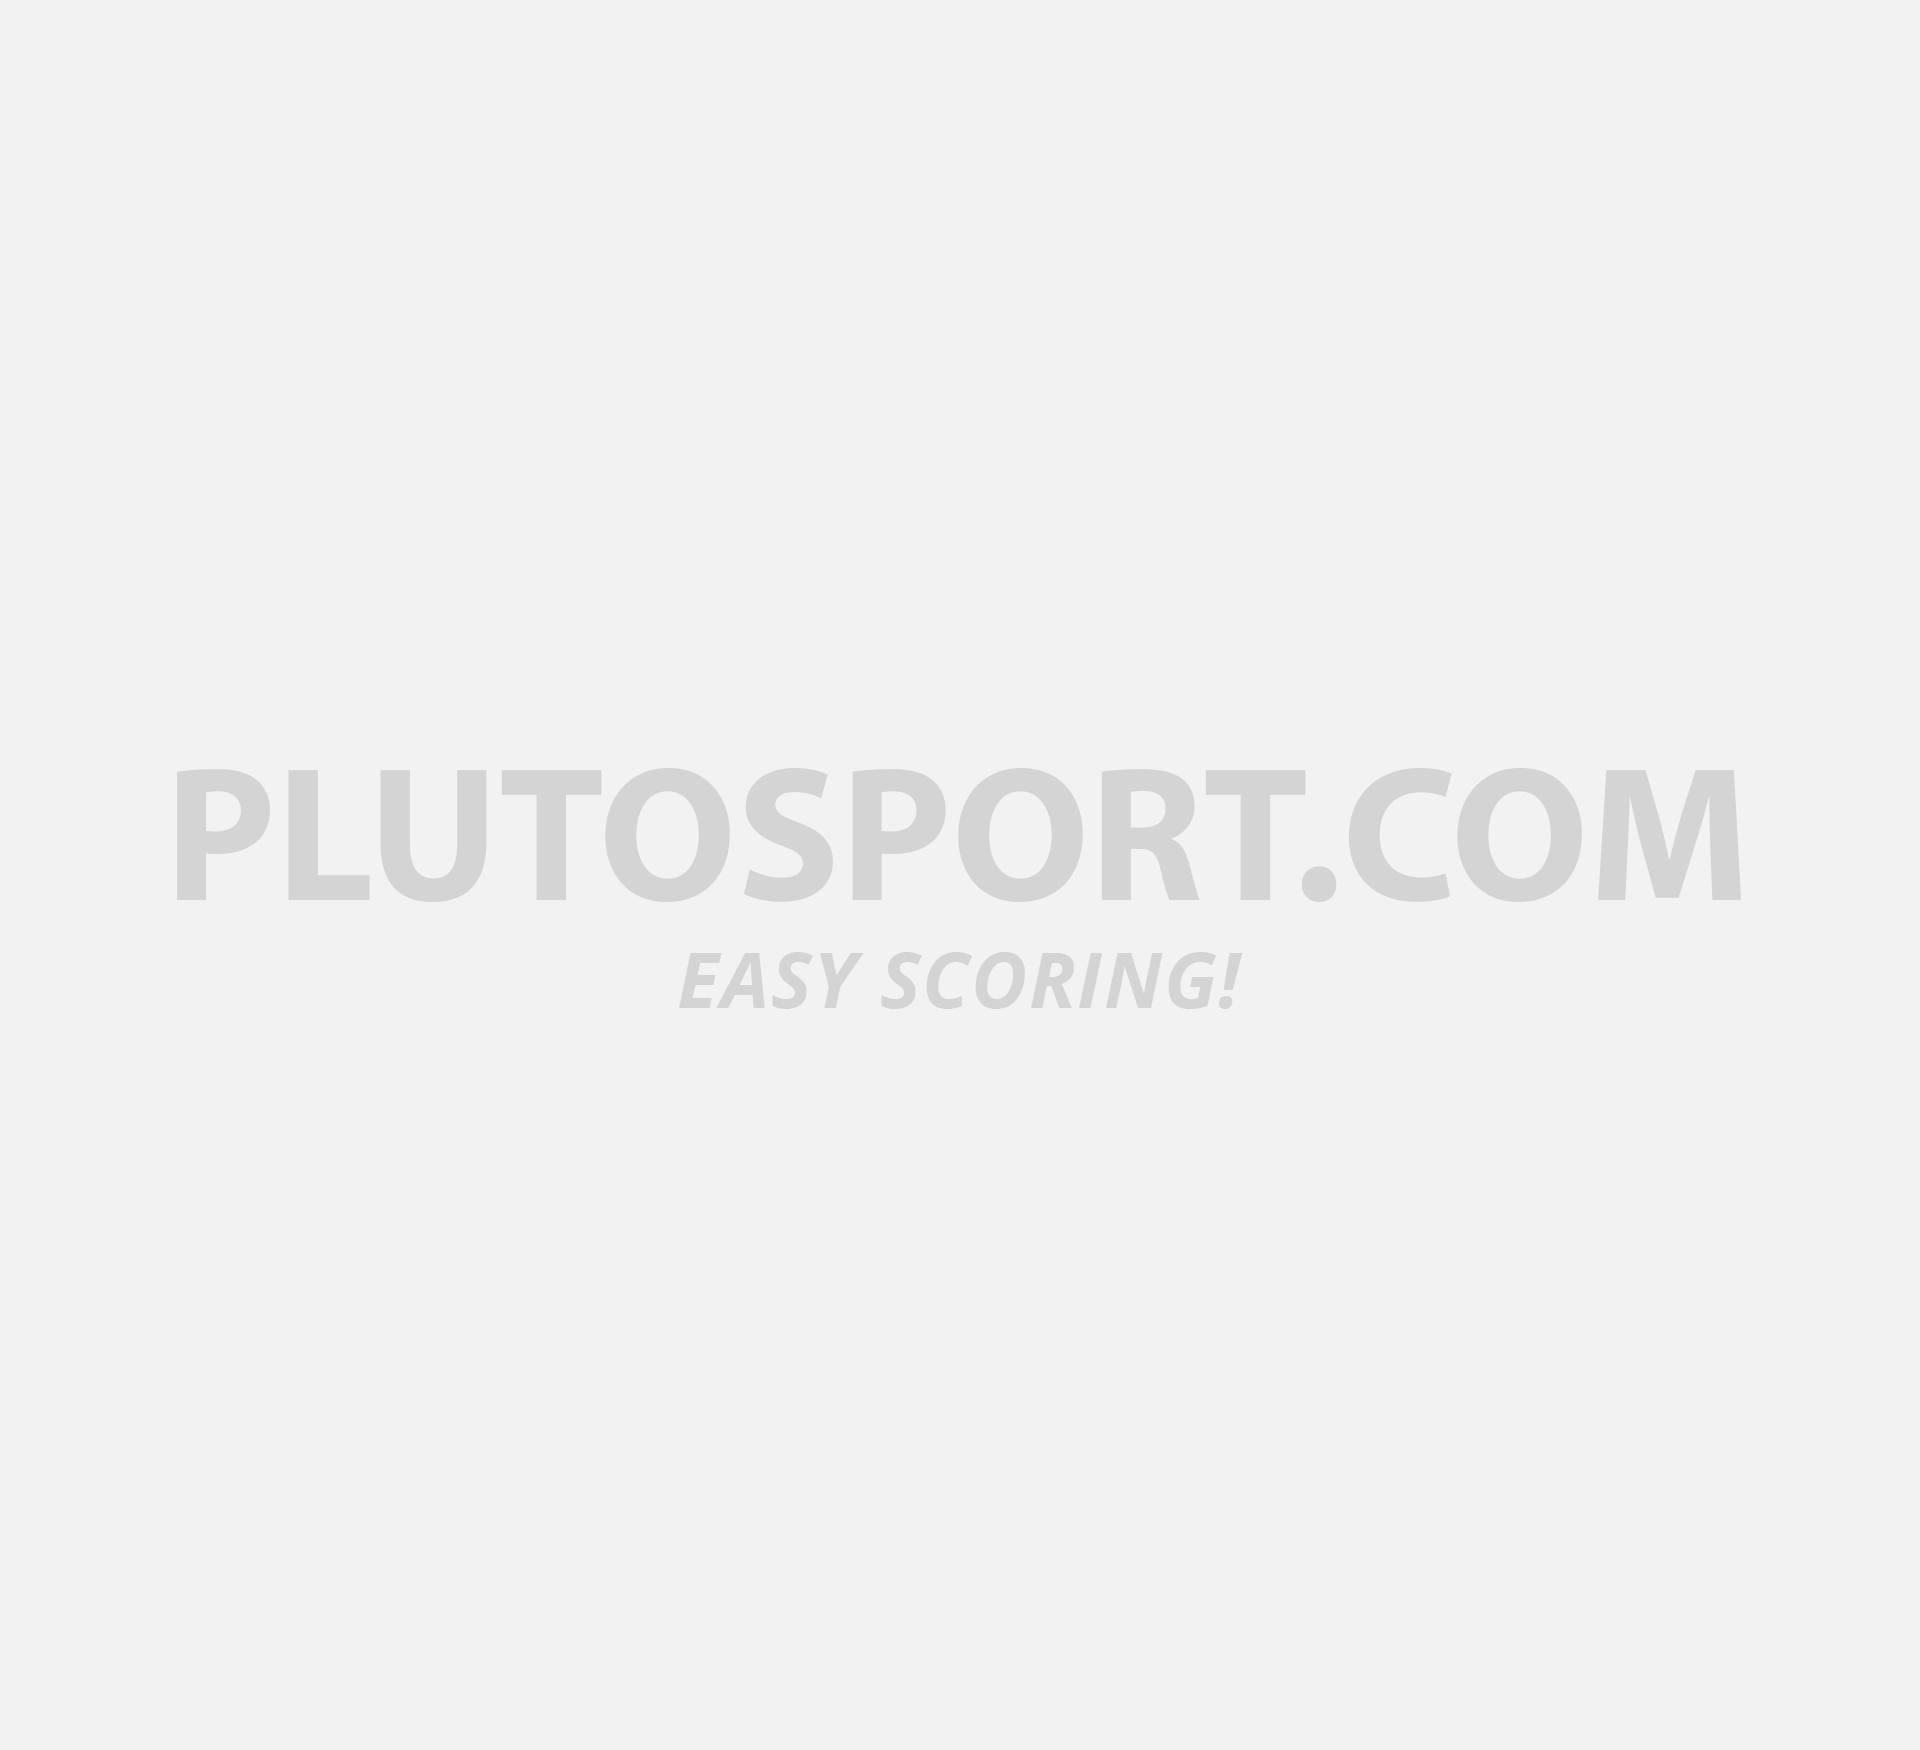 f7b266e9dbc2 Fila Tricolore Tracksuit Men - Tracksuits - Clothing - Tennis - Sports |  Plutosport